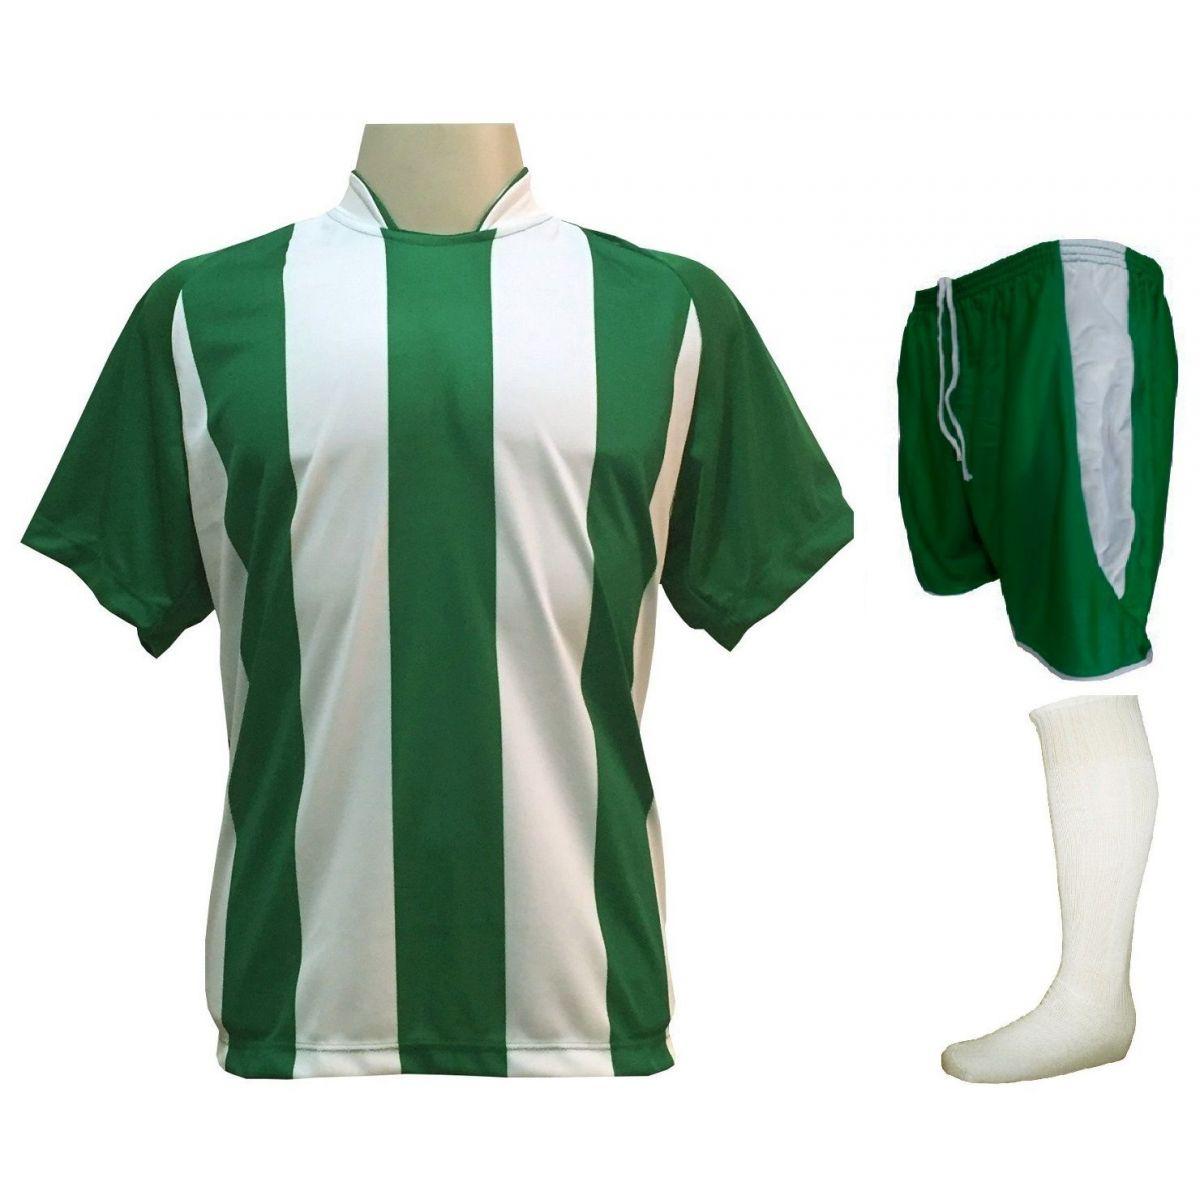 Fardamento Completo modelo Milan 20+2 (20 camisas Verde/Branco + 20 calções modelo Copa Verde/Branco + 20 pares de meiões Branco + 2 conjuntos de goleiro) + Brindes